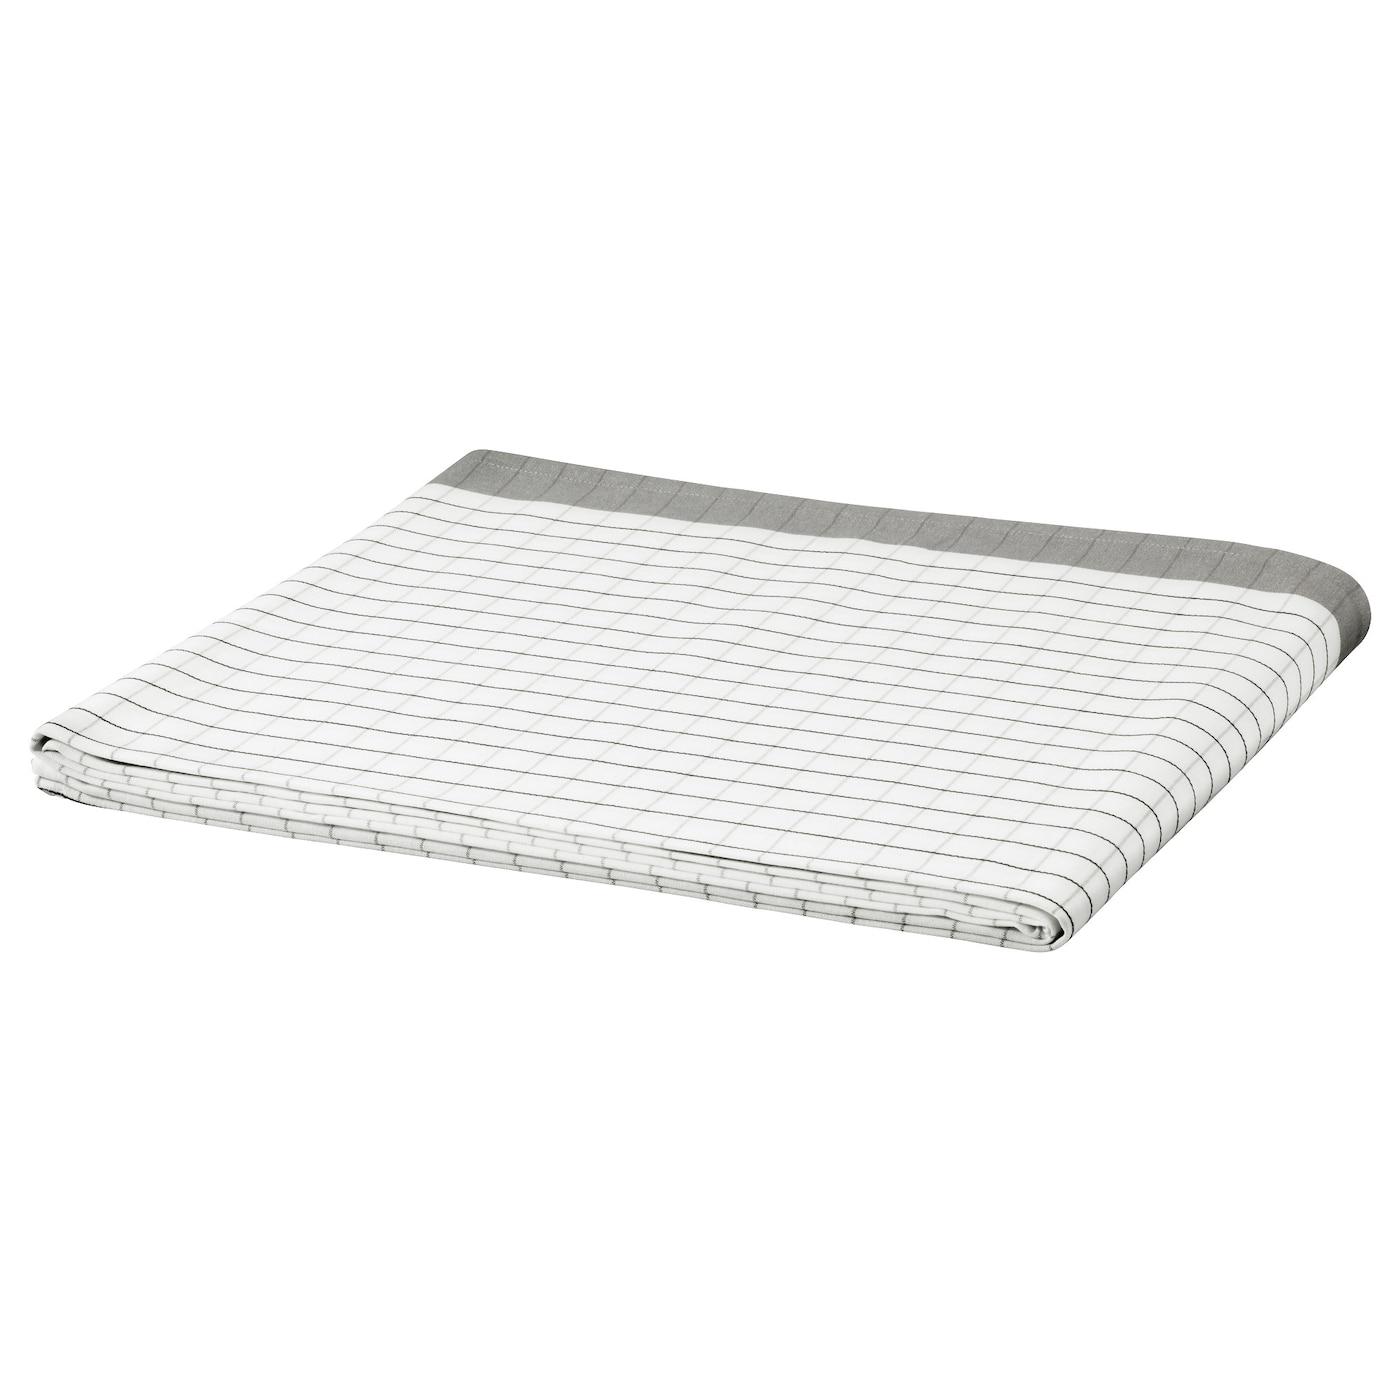 ikea 365 nappe blanc gris 145 x 240 cm ikea. Black Bedroom Furniture Sets. Home Design Ideas